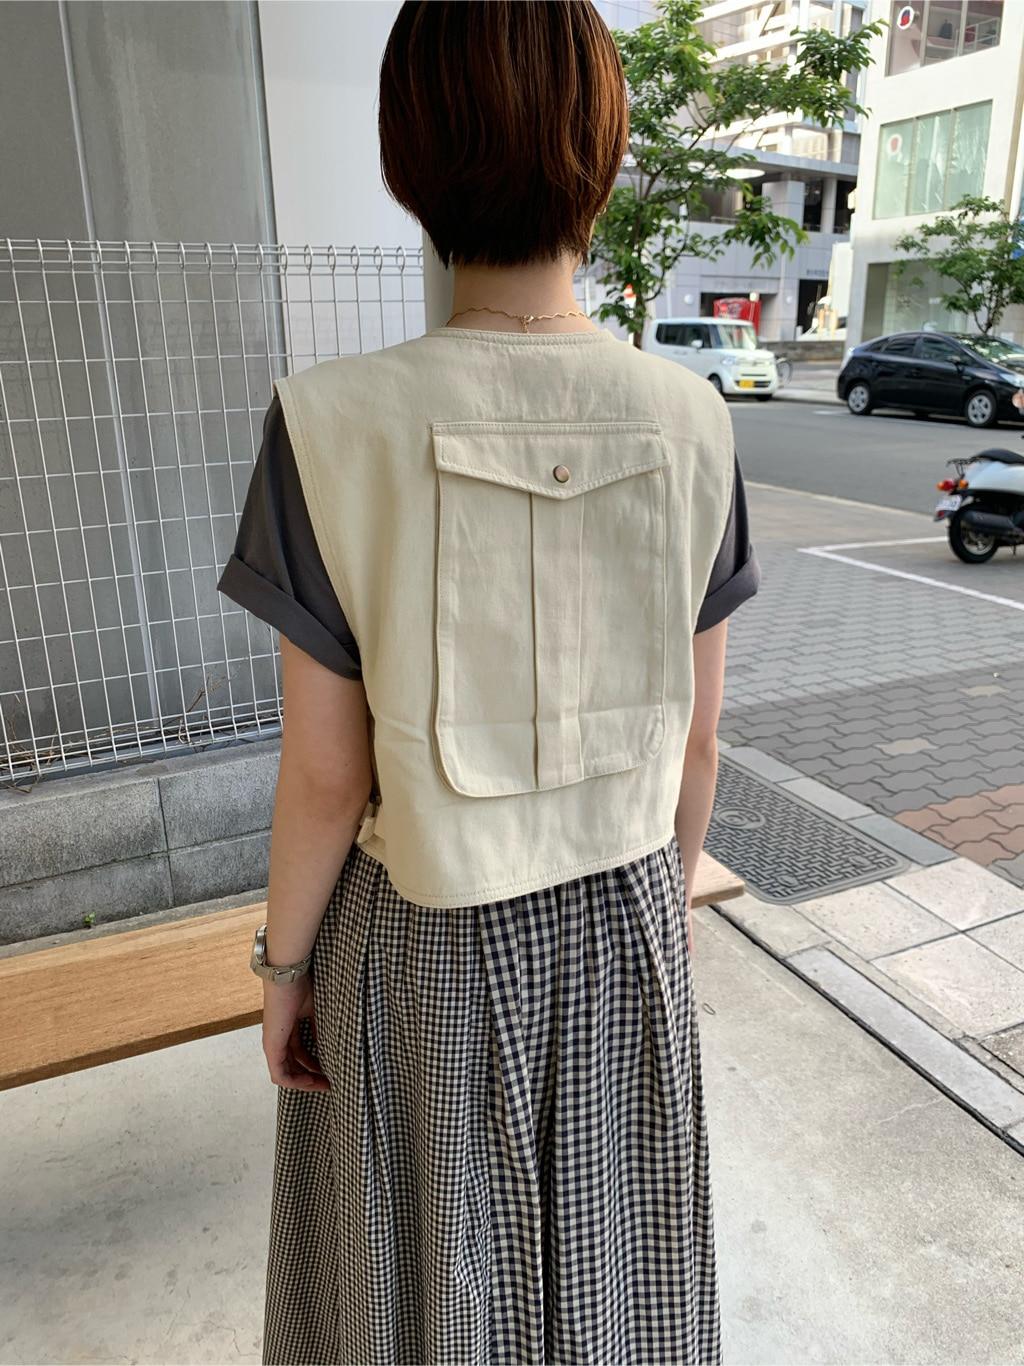 l'atelier du savon 名古屋栄路面 身長:161cm 2020.06.07